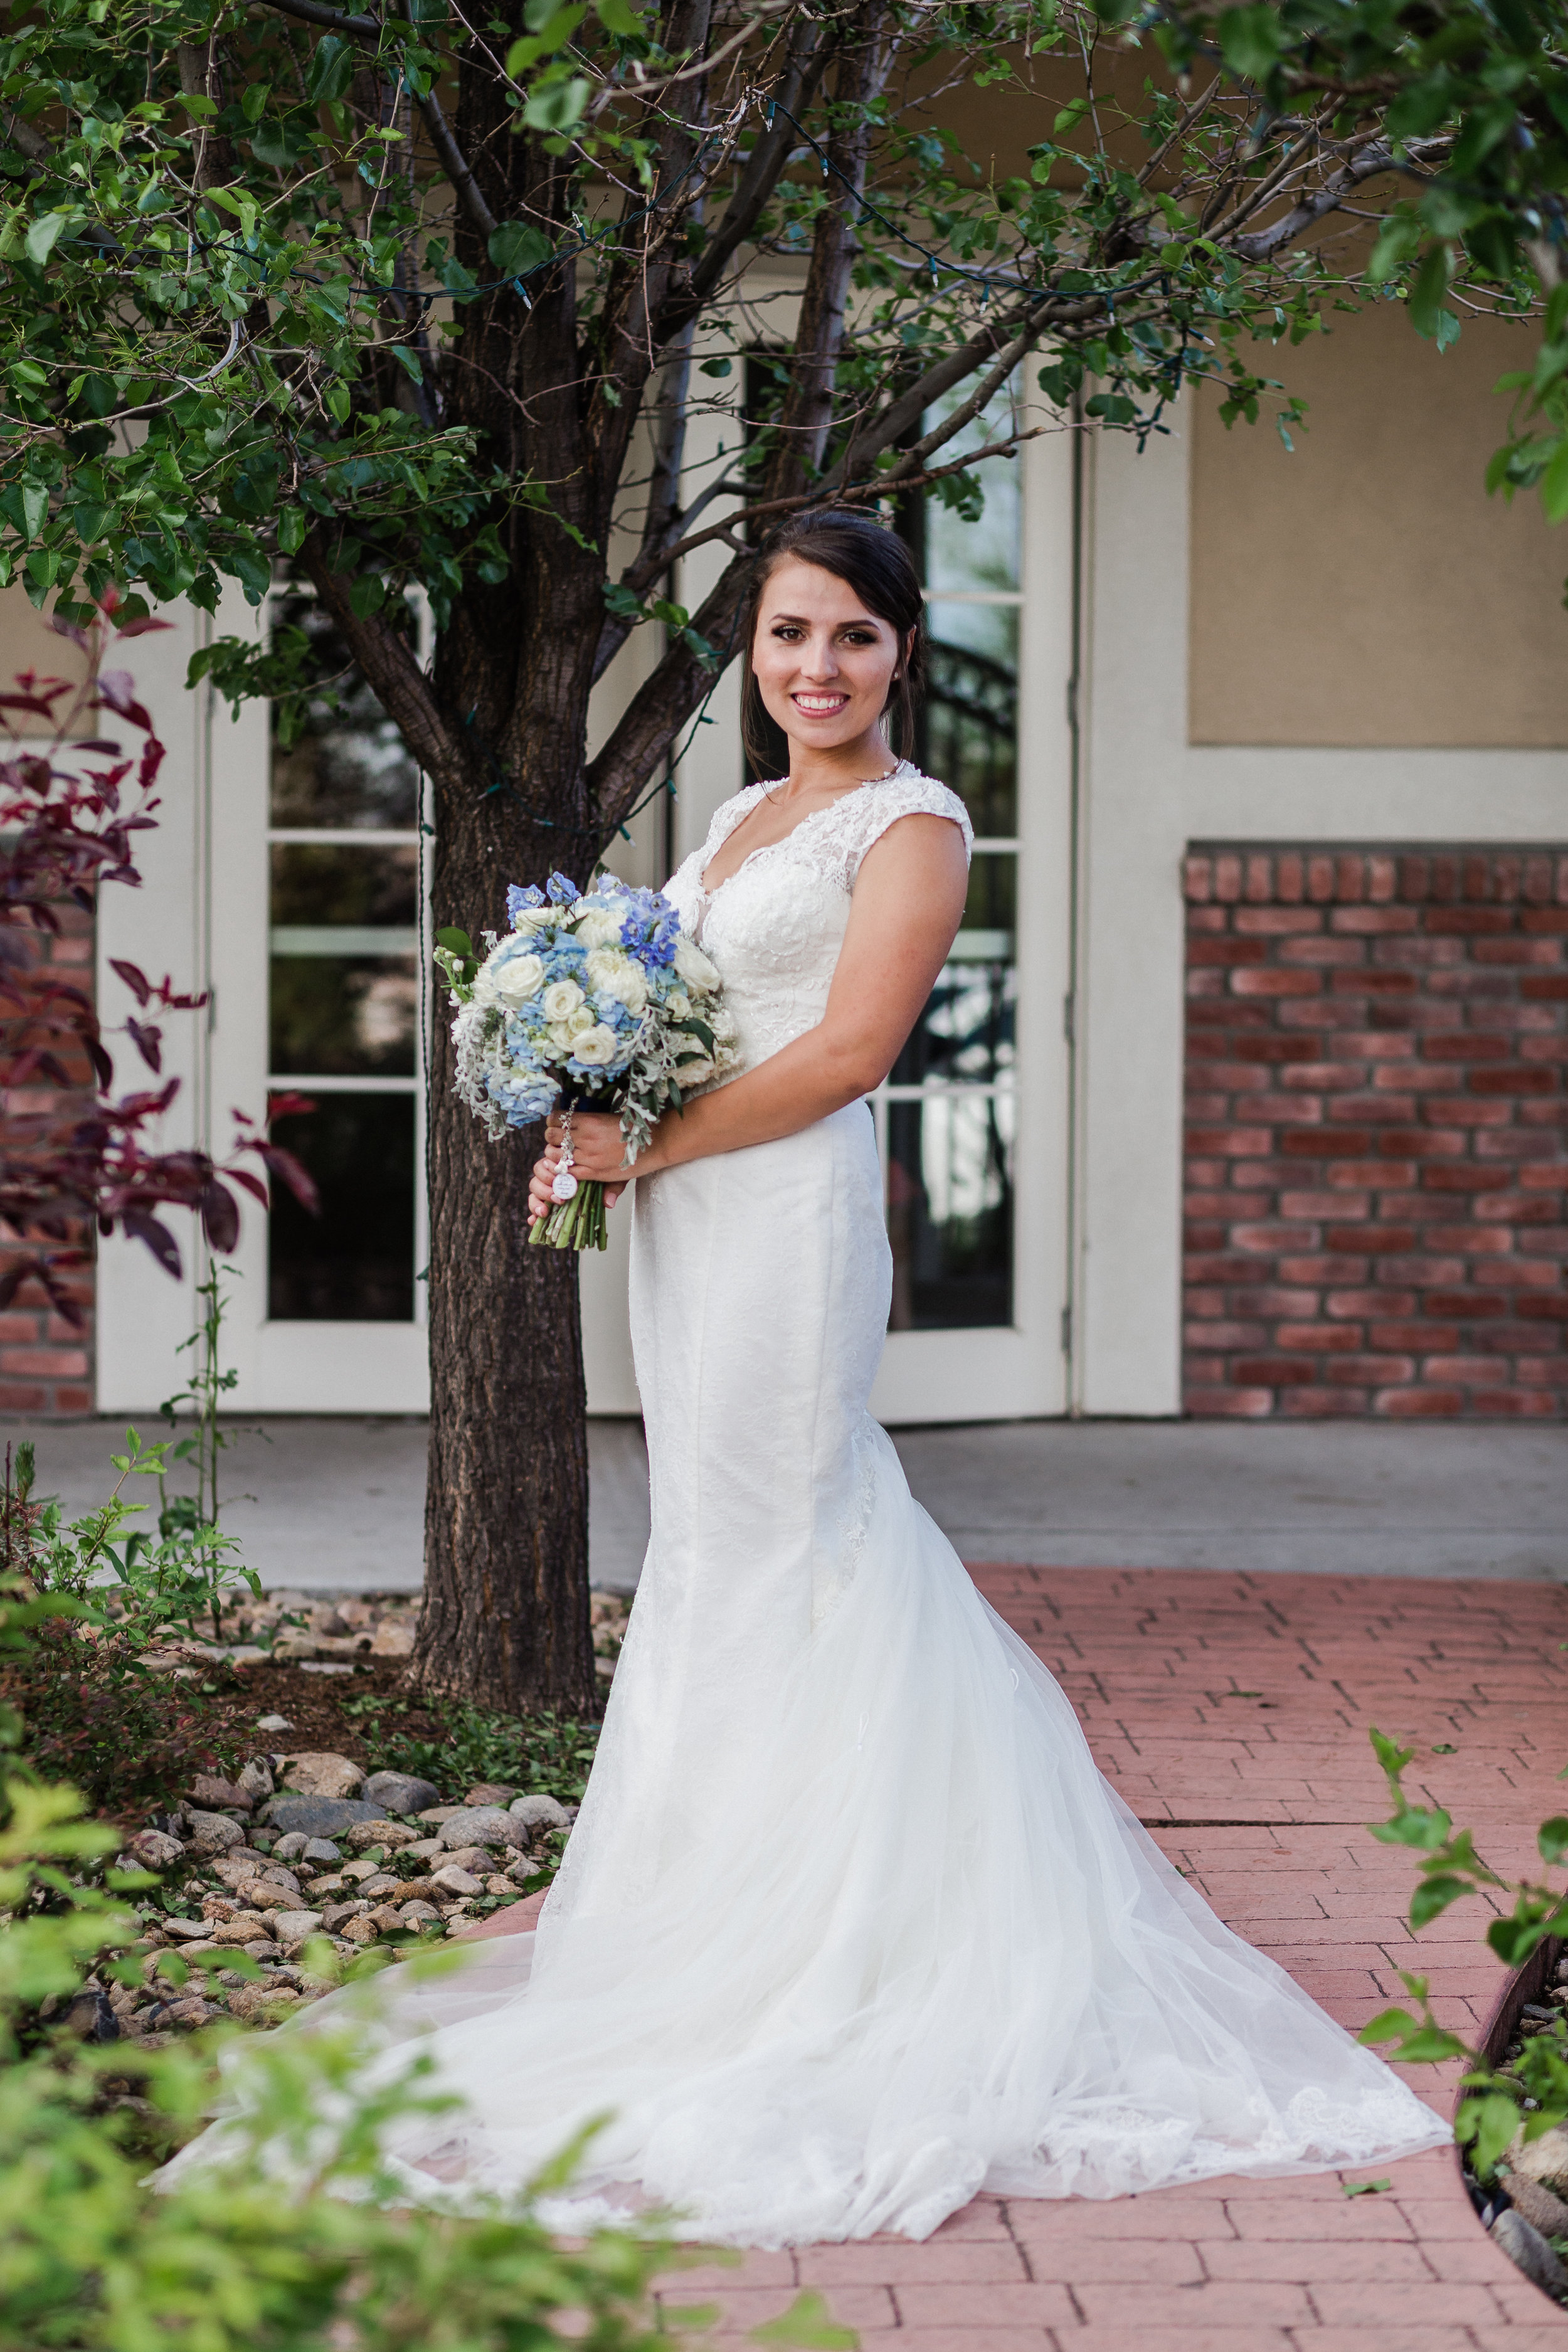 Denver-traveling-wedding-hairstylist-Colorado-updo-and-braiding-specialist